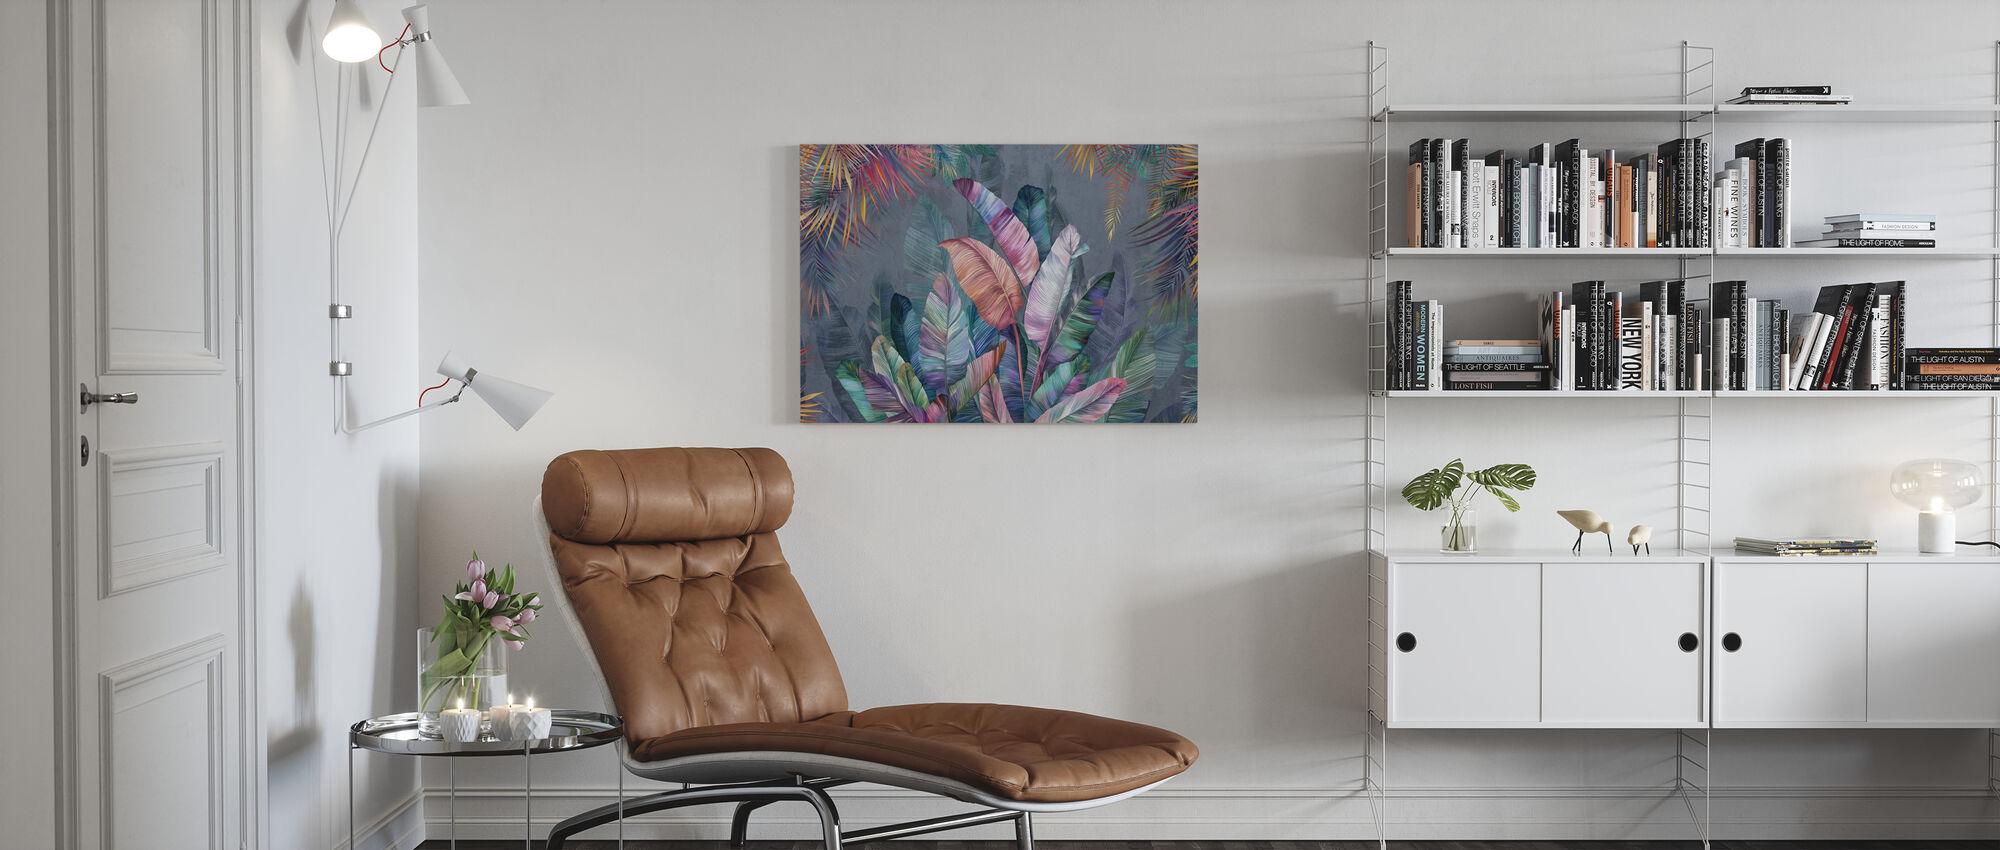 Potpourri Banana Leaves - Canvas print - Living Room